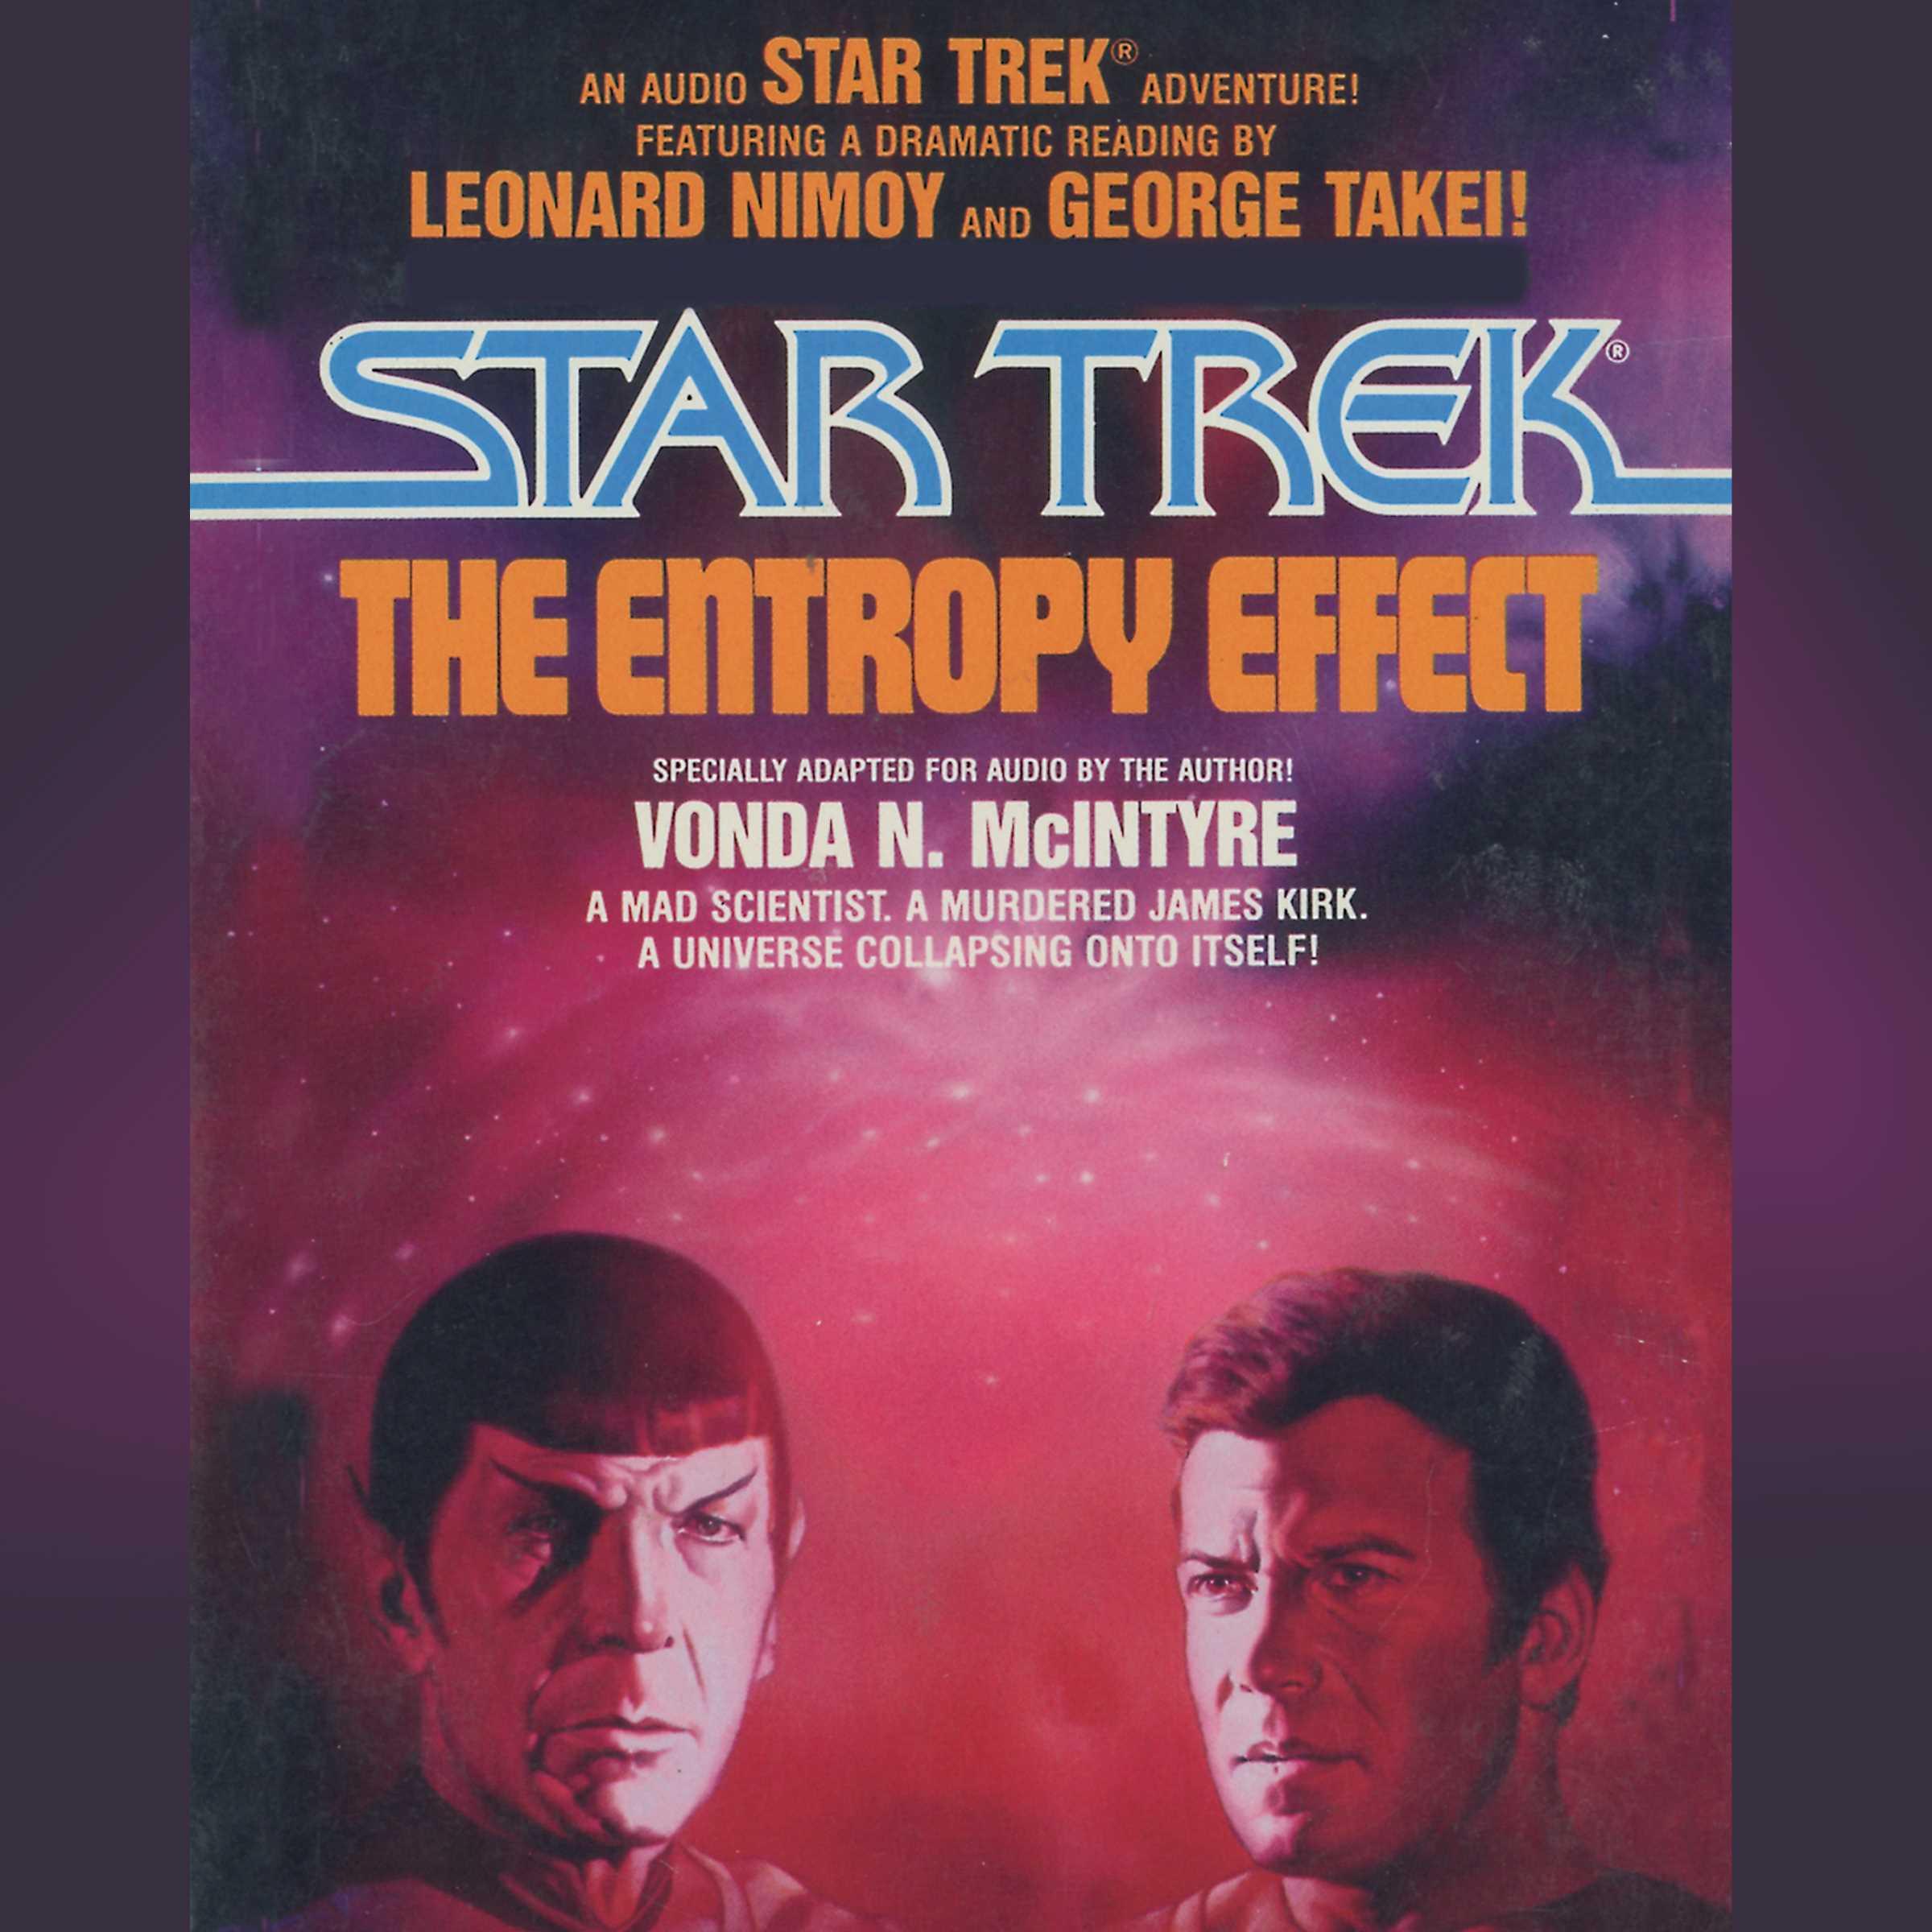 Star trek entropy effect 9780743545365 hr